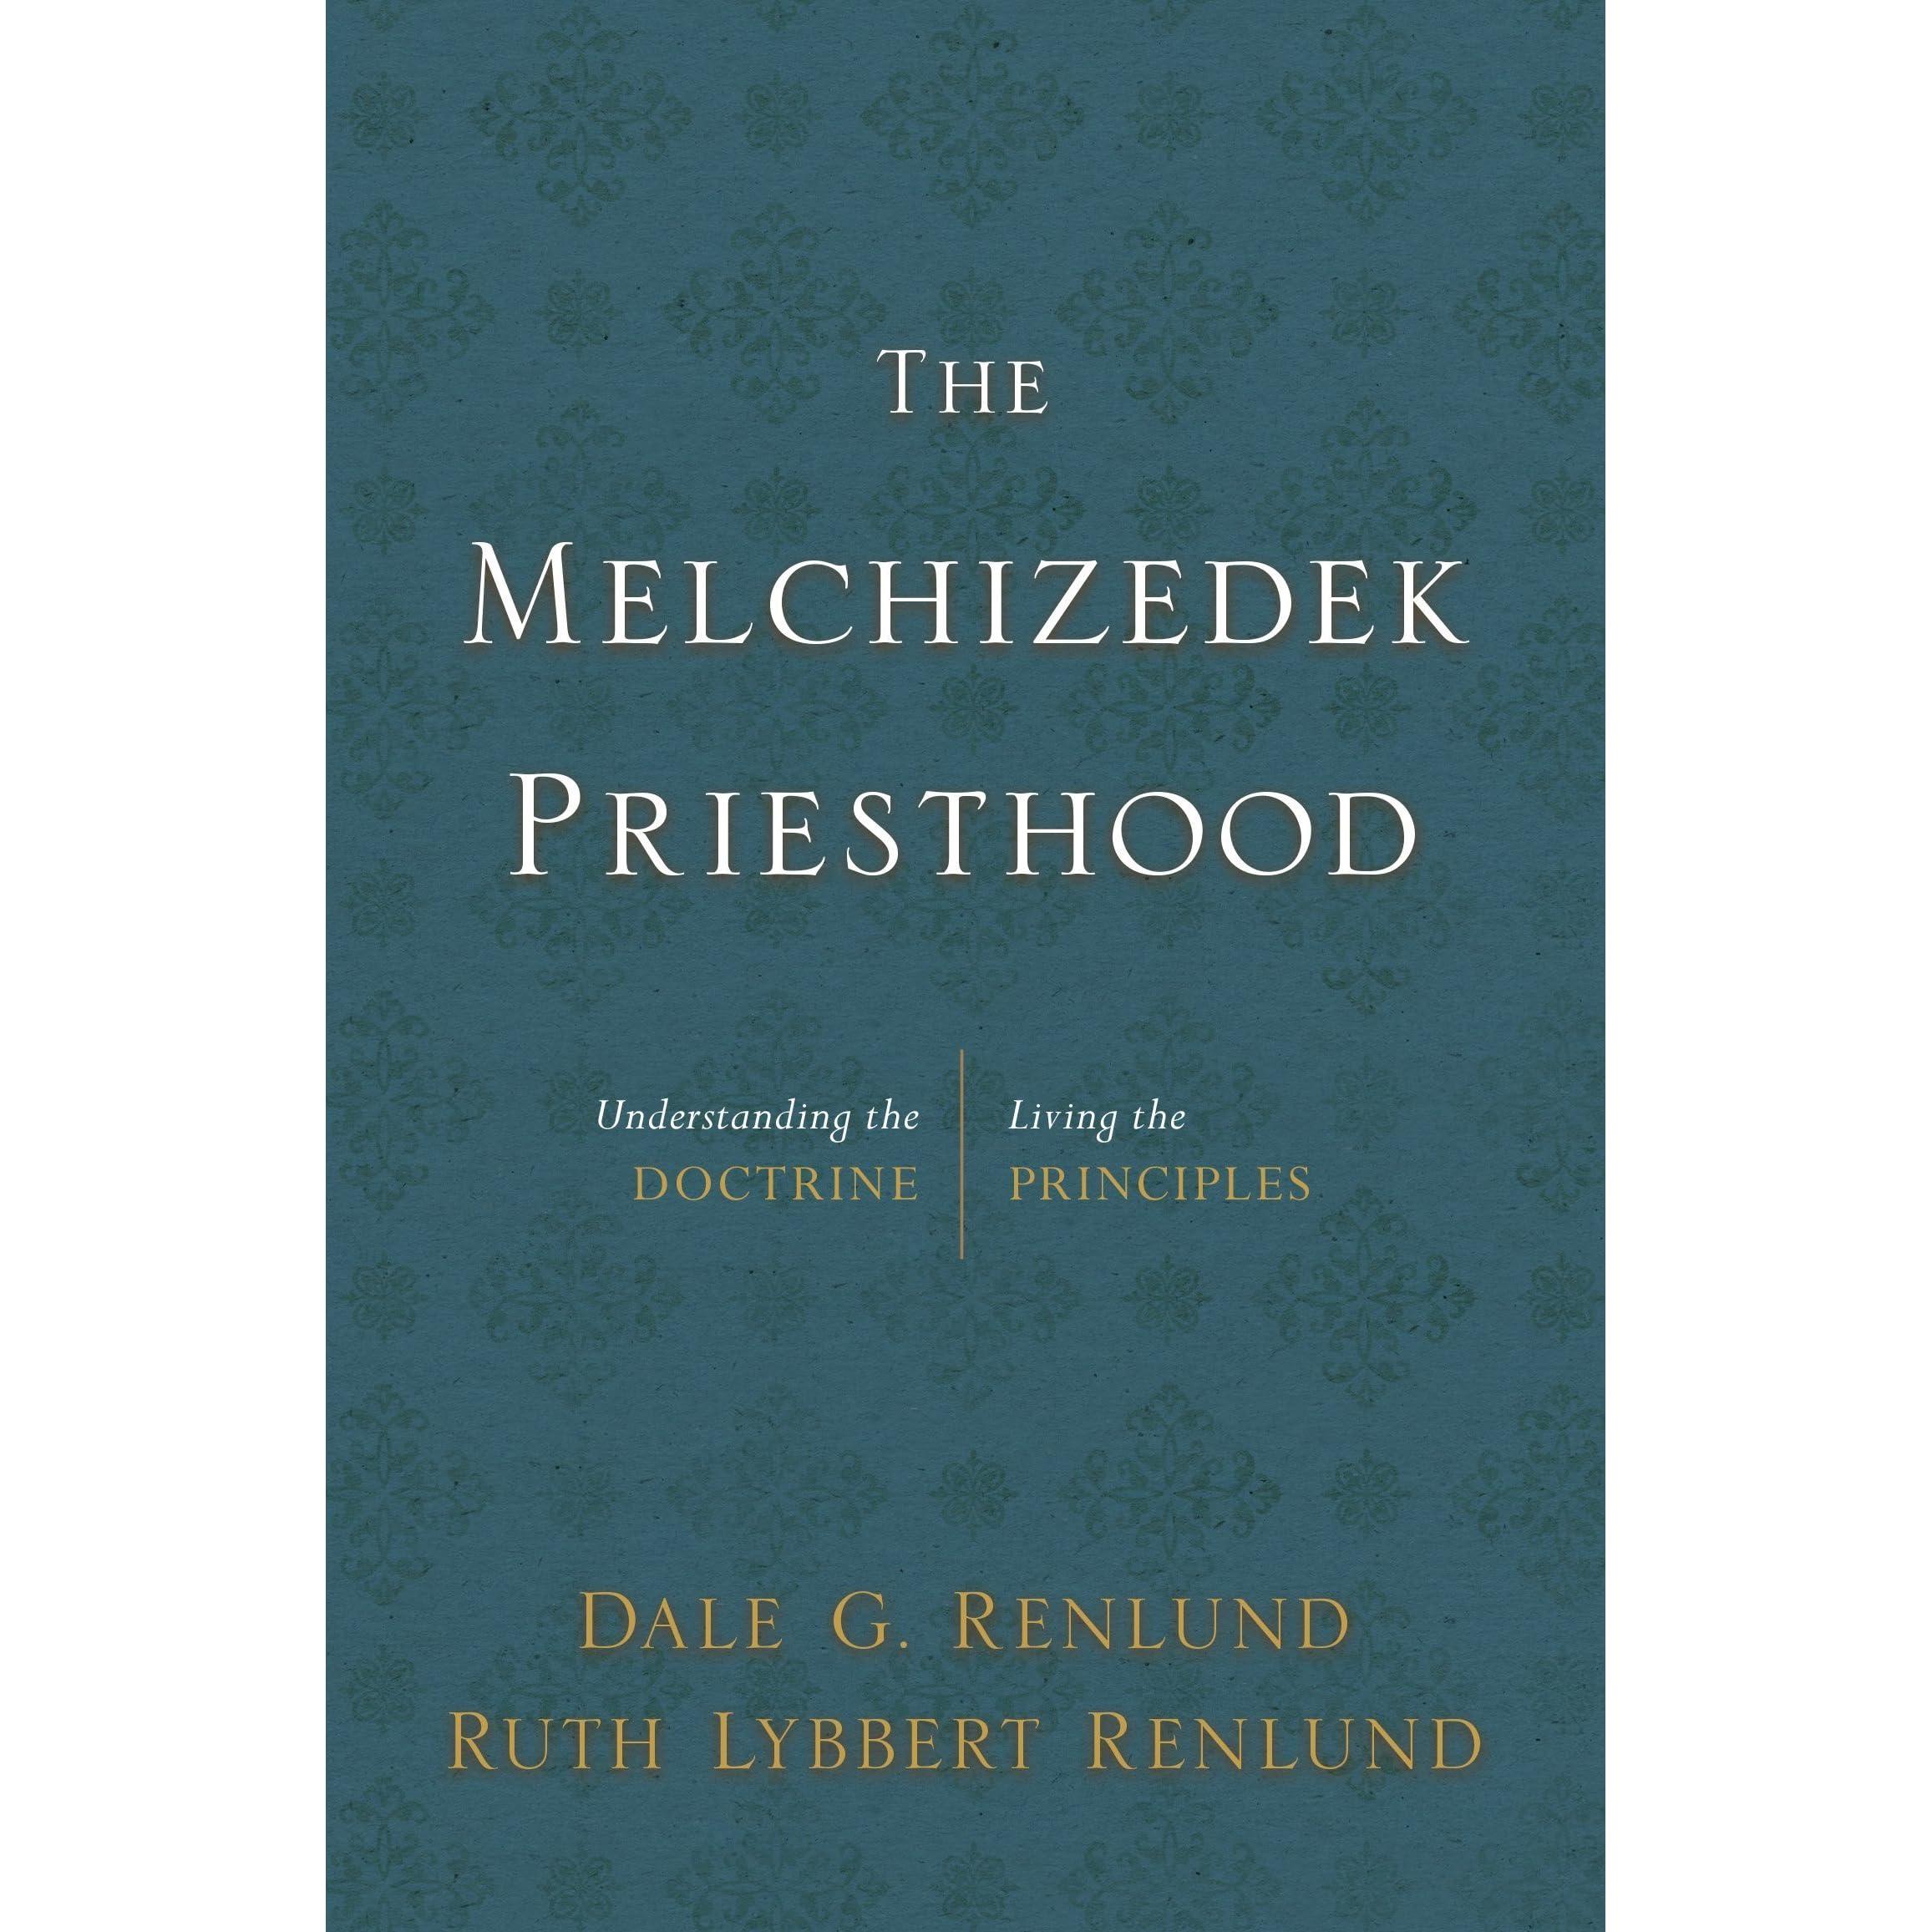 The Melchizedek Priesthood: Understanding the Doctrine, Living the